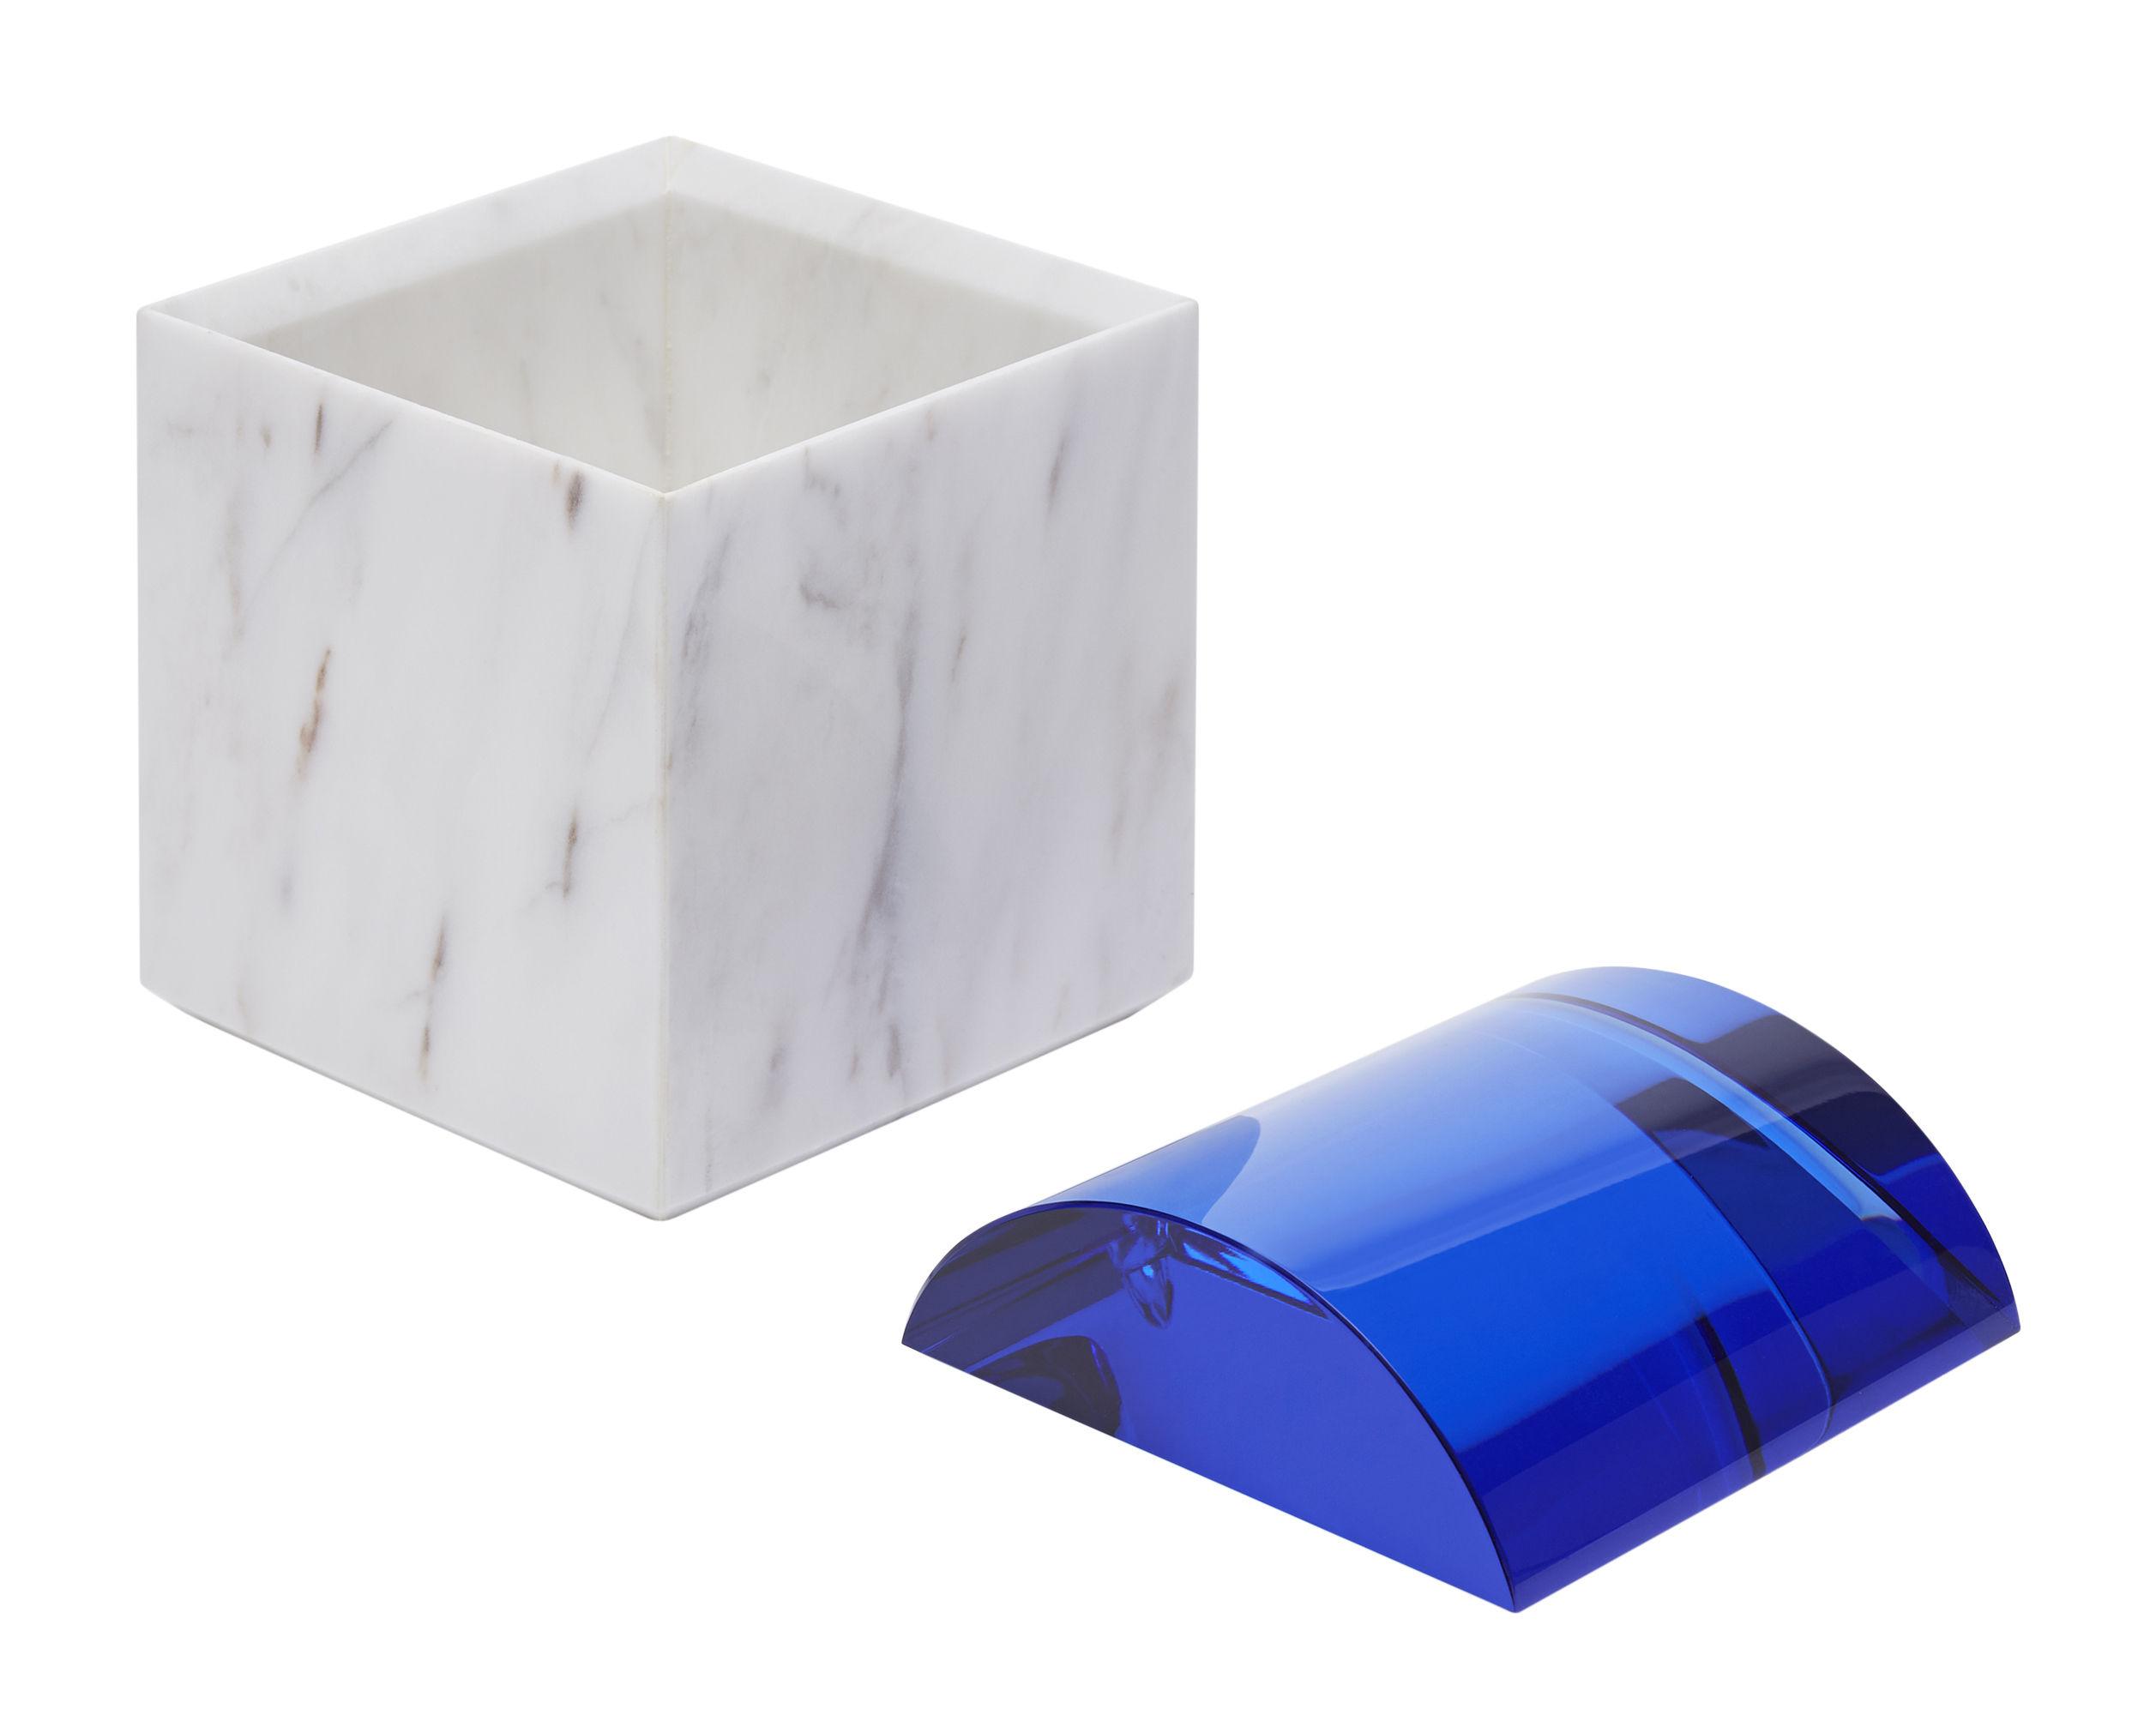 Bo te lid curve marbre verre marbre blanc bleu tom for Boite a couture curver